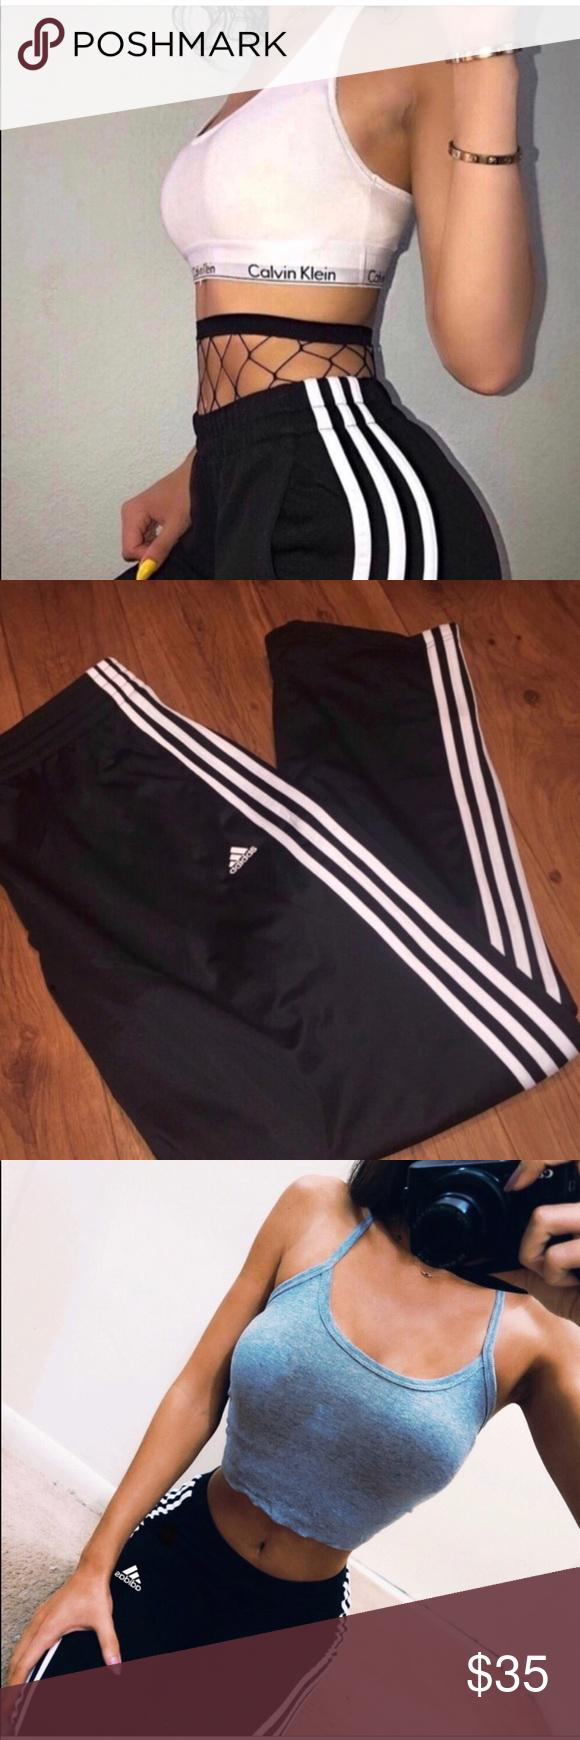 Pantalones deportivos deportivos Adidas Black Black Superstar Adidas | 3ea650b - sulfasalazisalaz.website